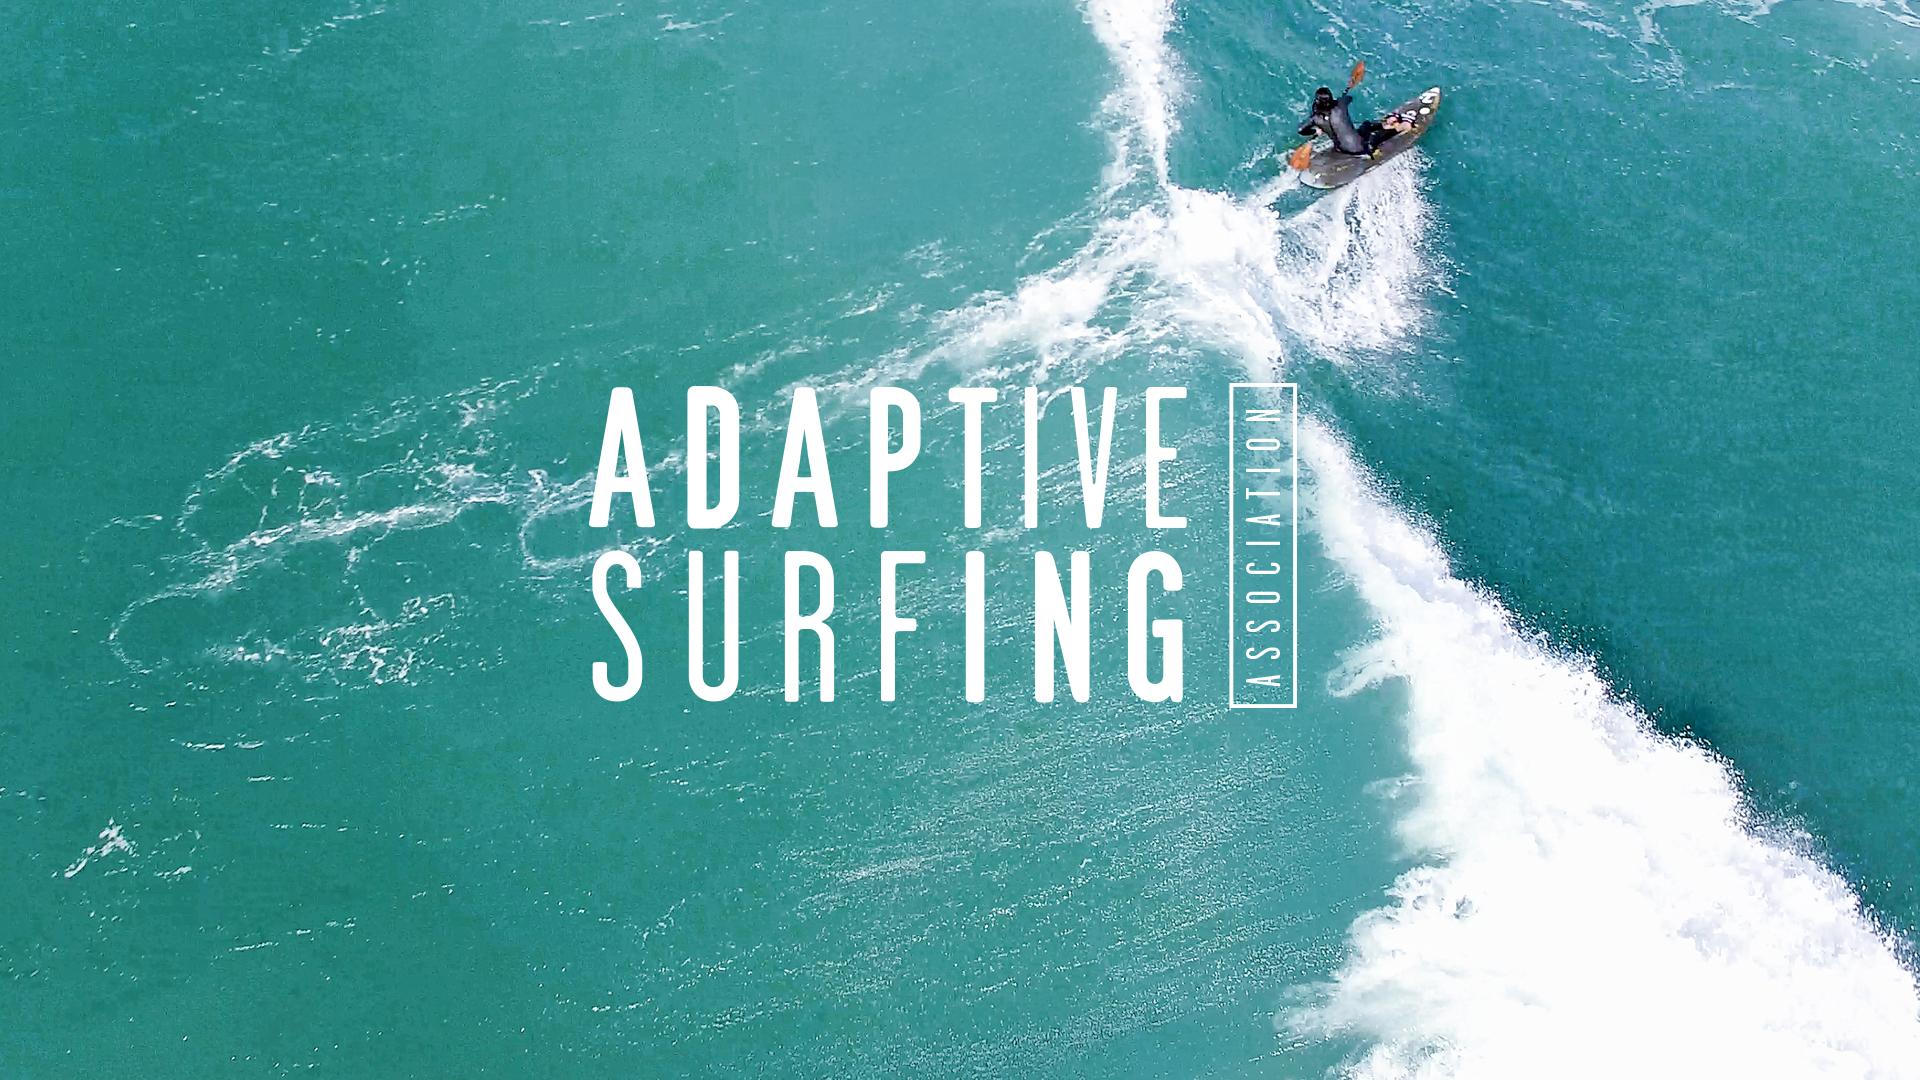 adaptivesurfing_portfolio.jpg